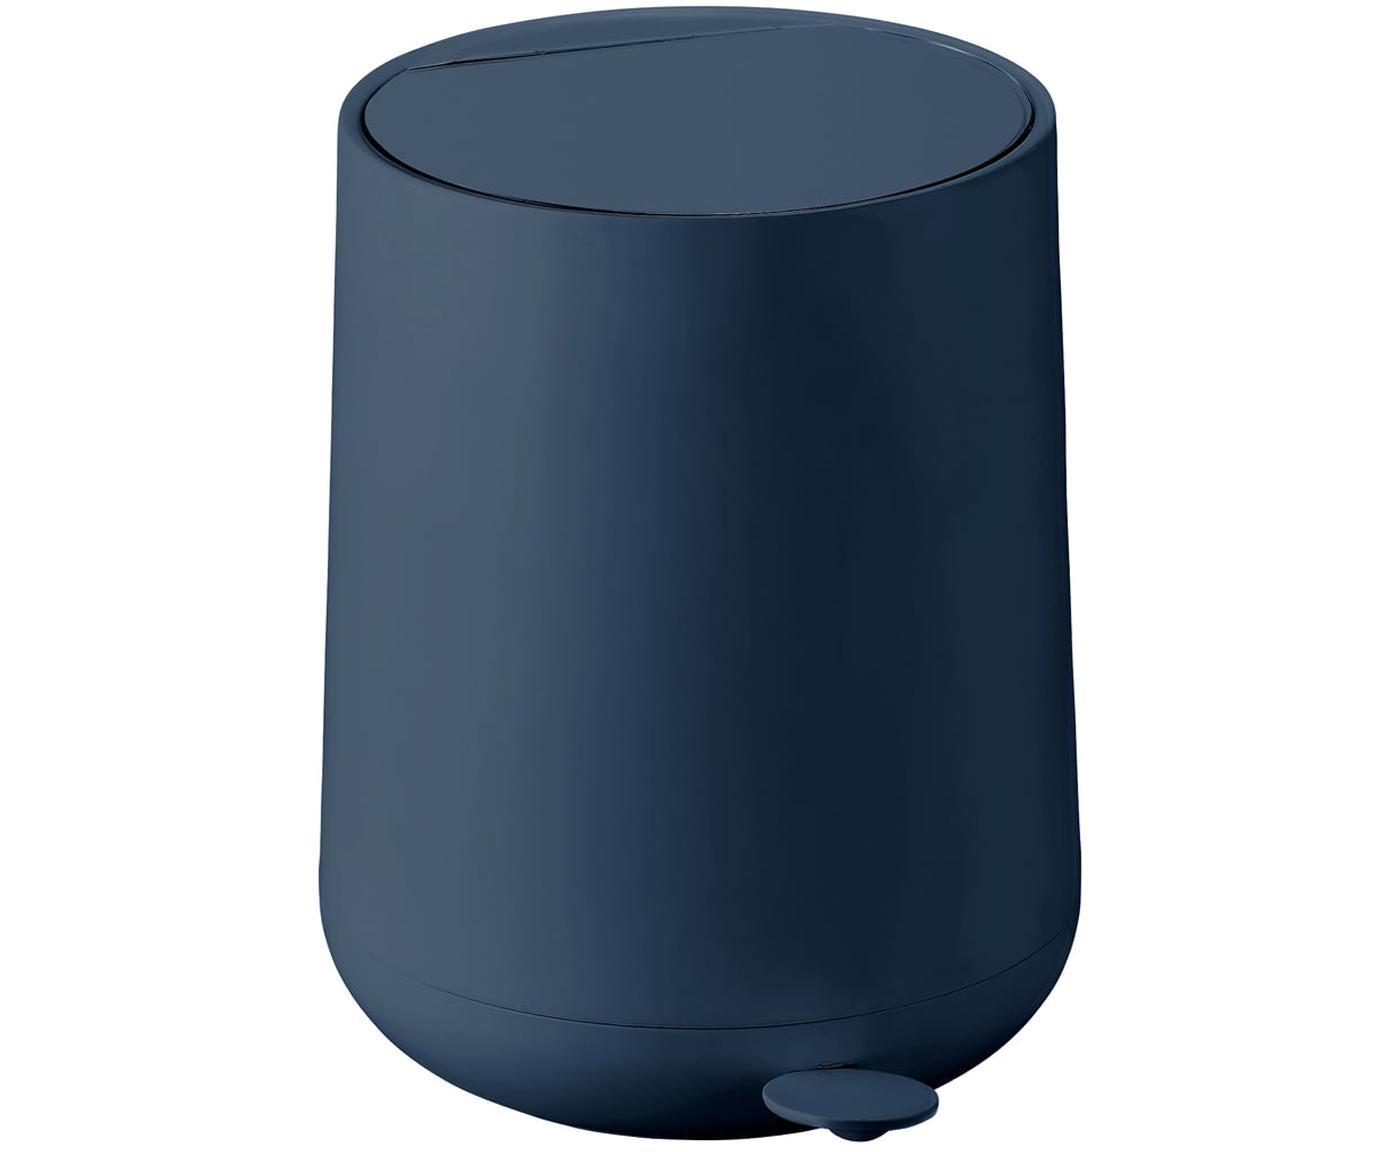 Pattumiera Nova, Materiale sintetico ABS, Blu, Ø 23 x A 29 cm